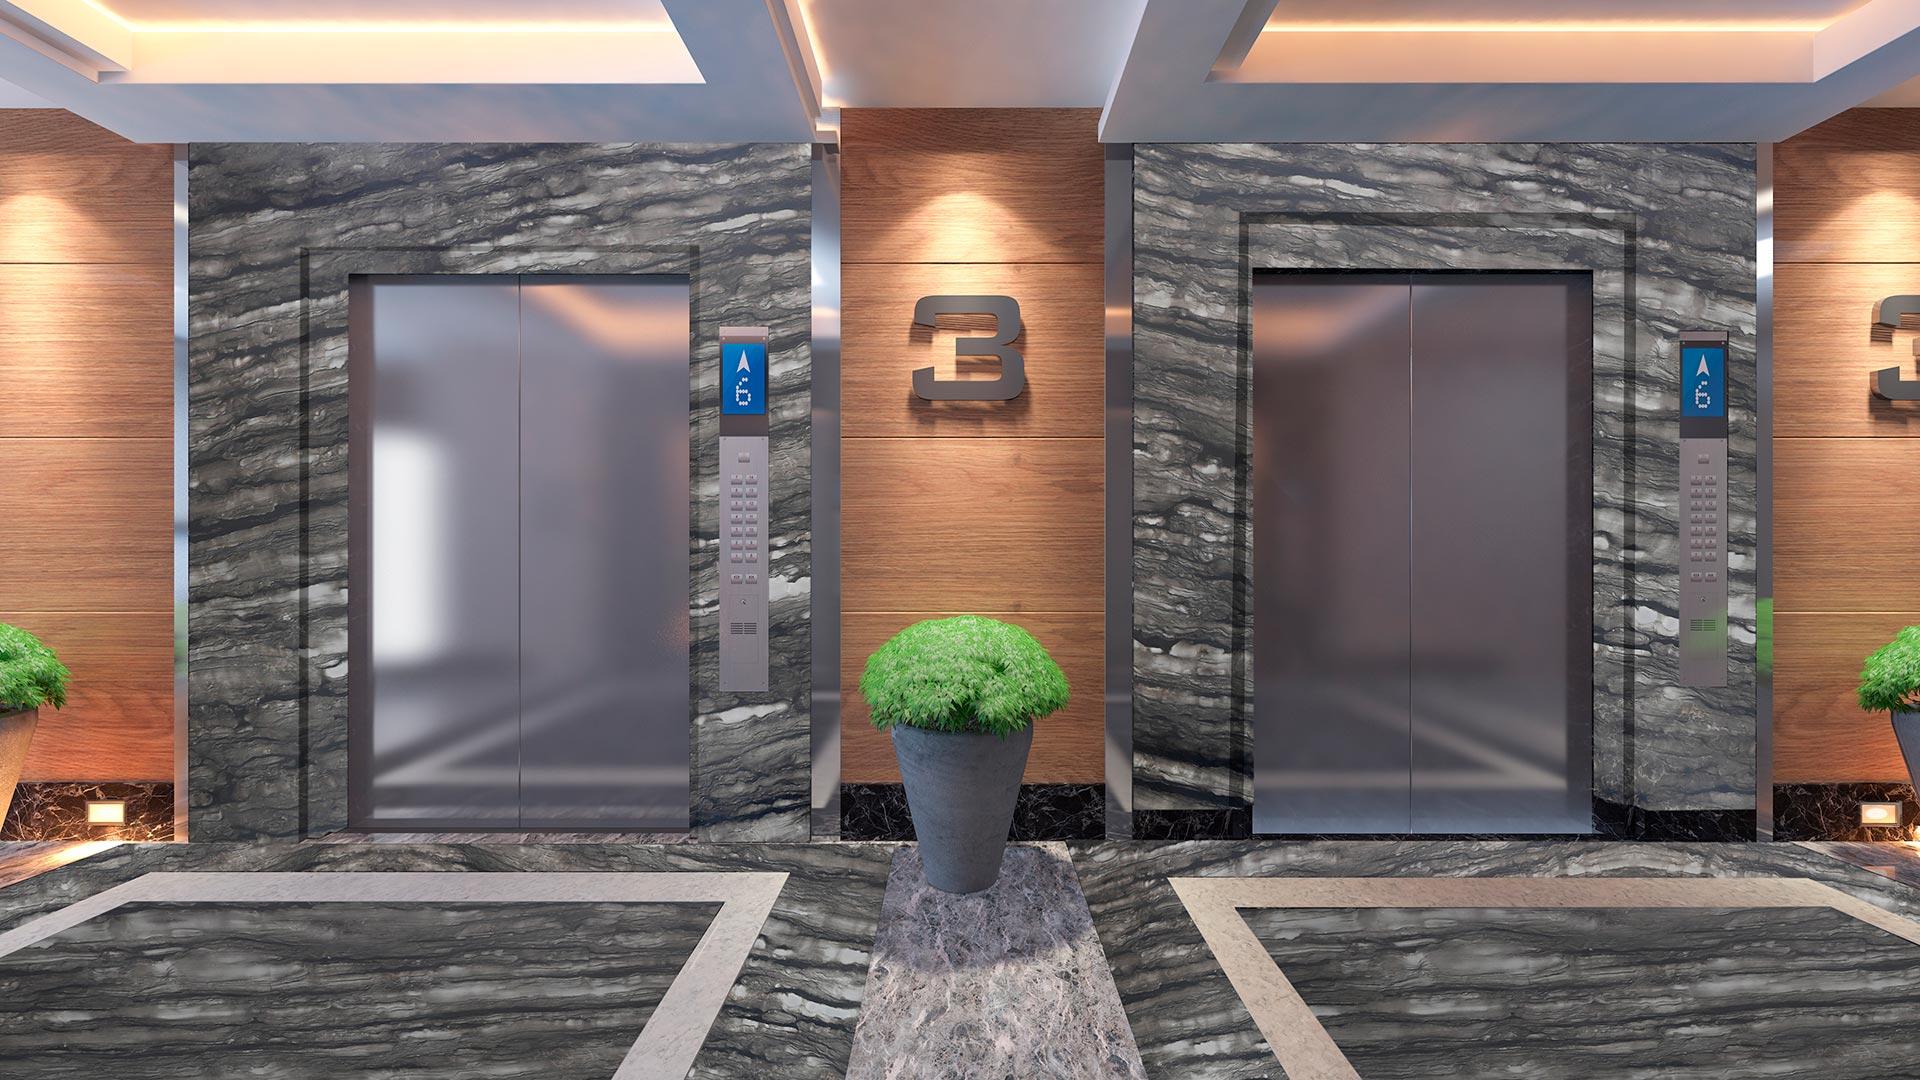 marble-sequoia-browns-elevator